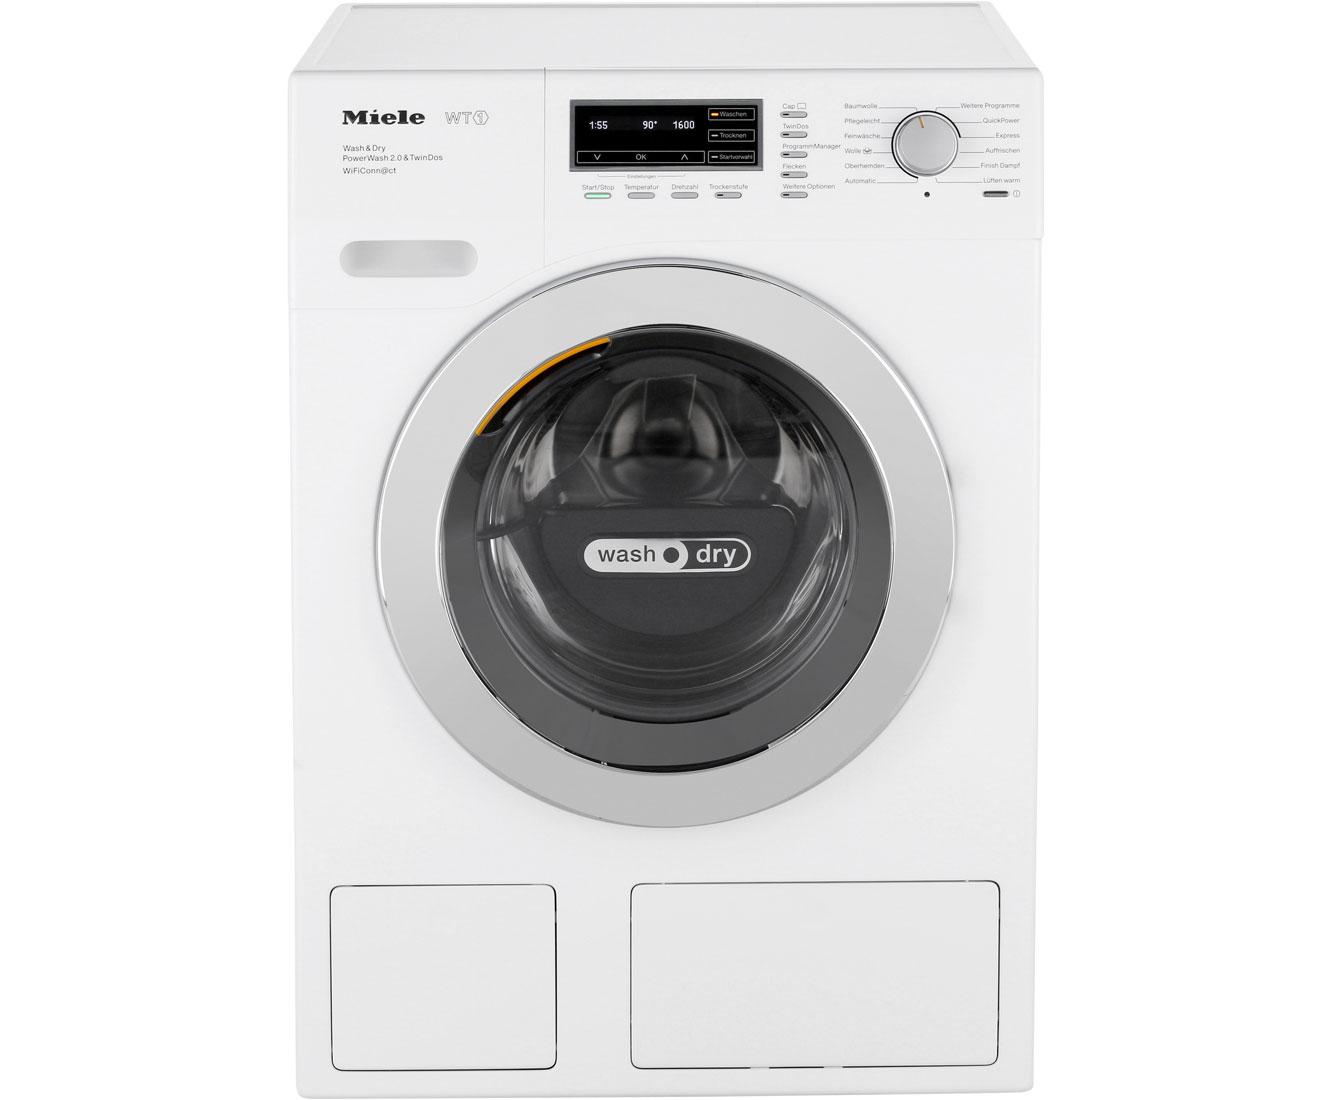 Miele wth730 wpm waschtrockner 7 kg waschen 4 kg trocknen 1600